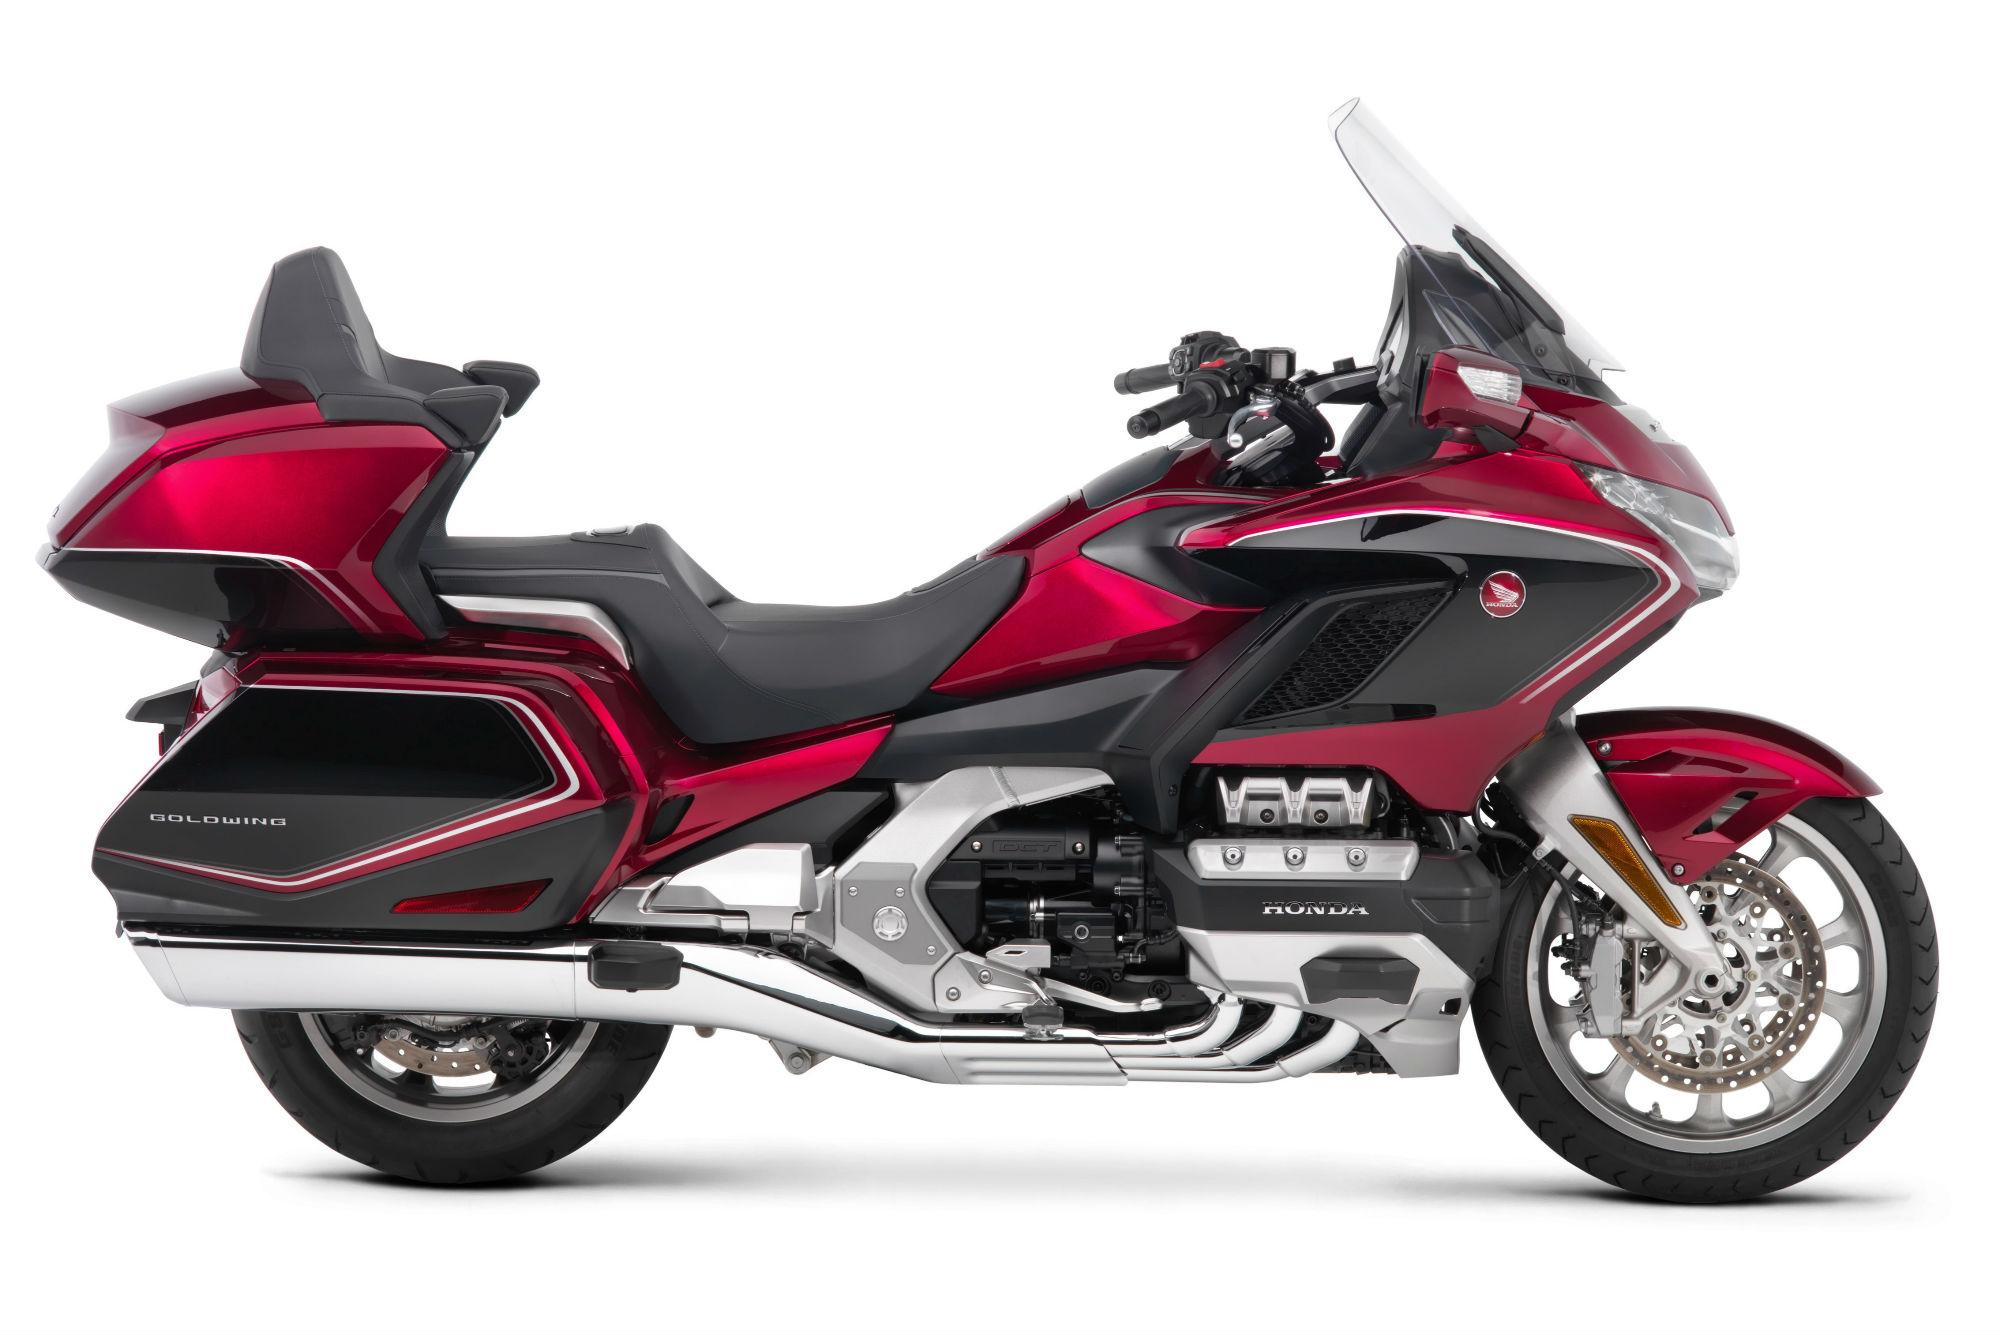 All-new Honda Gold Wing revealed